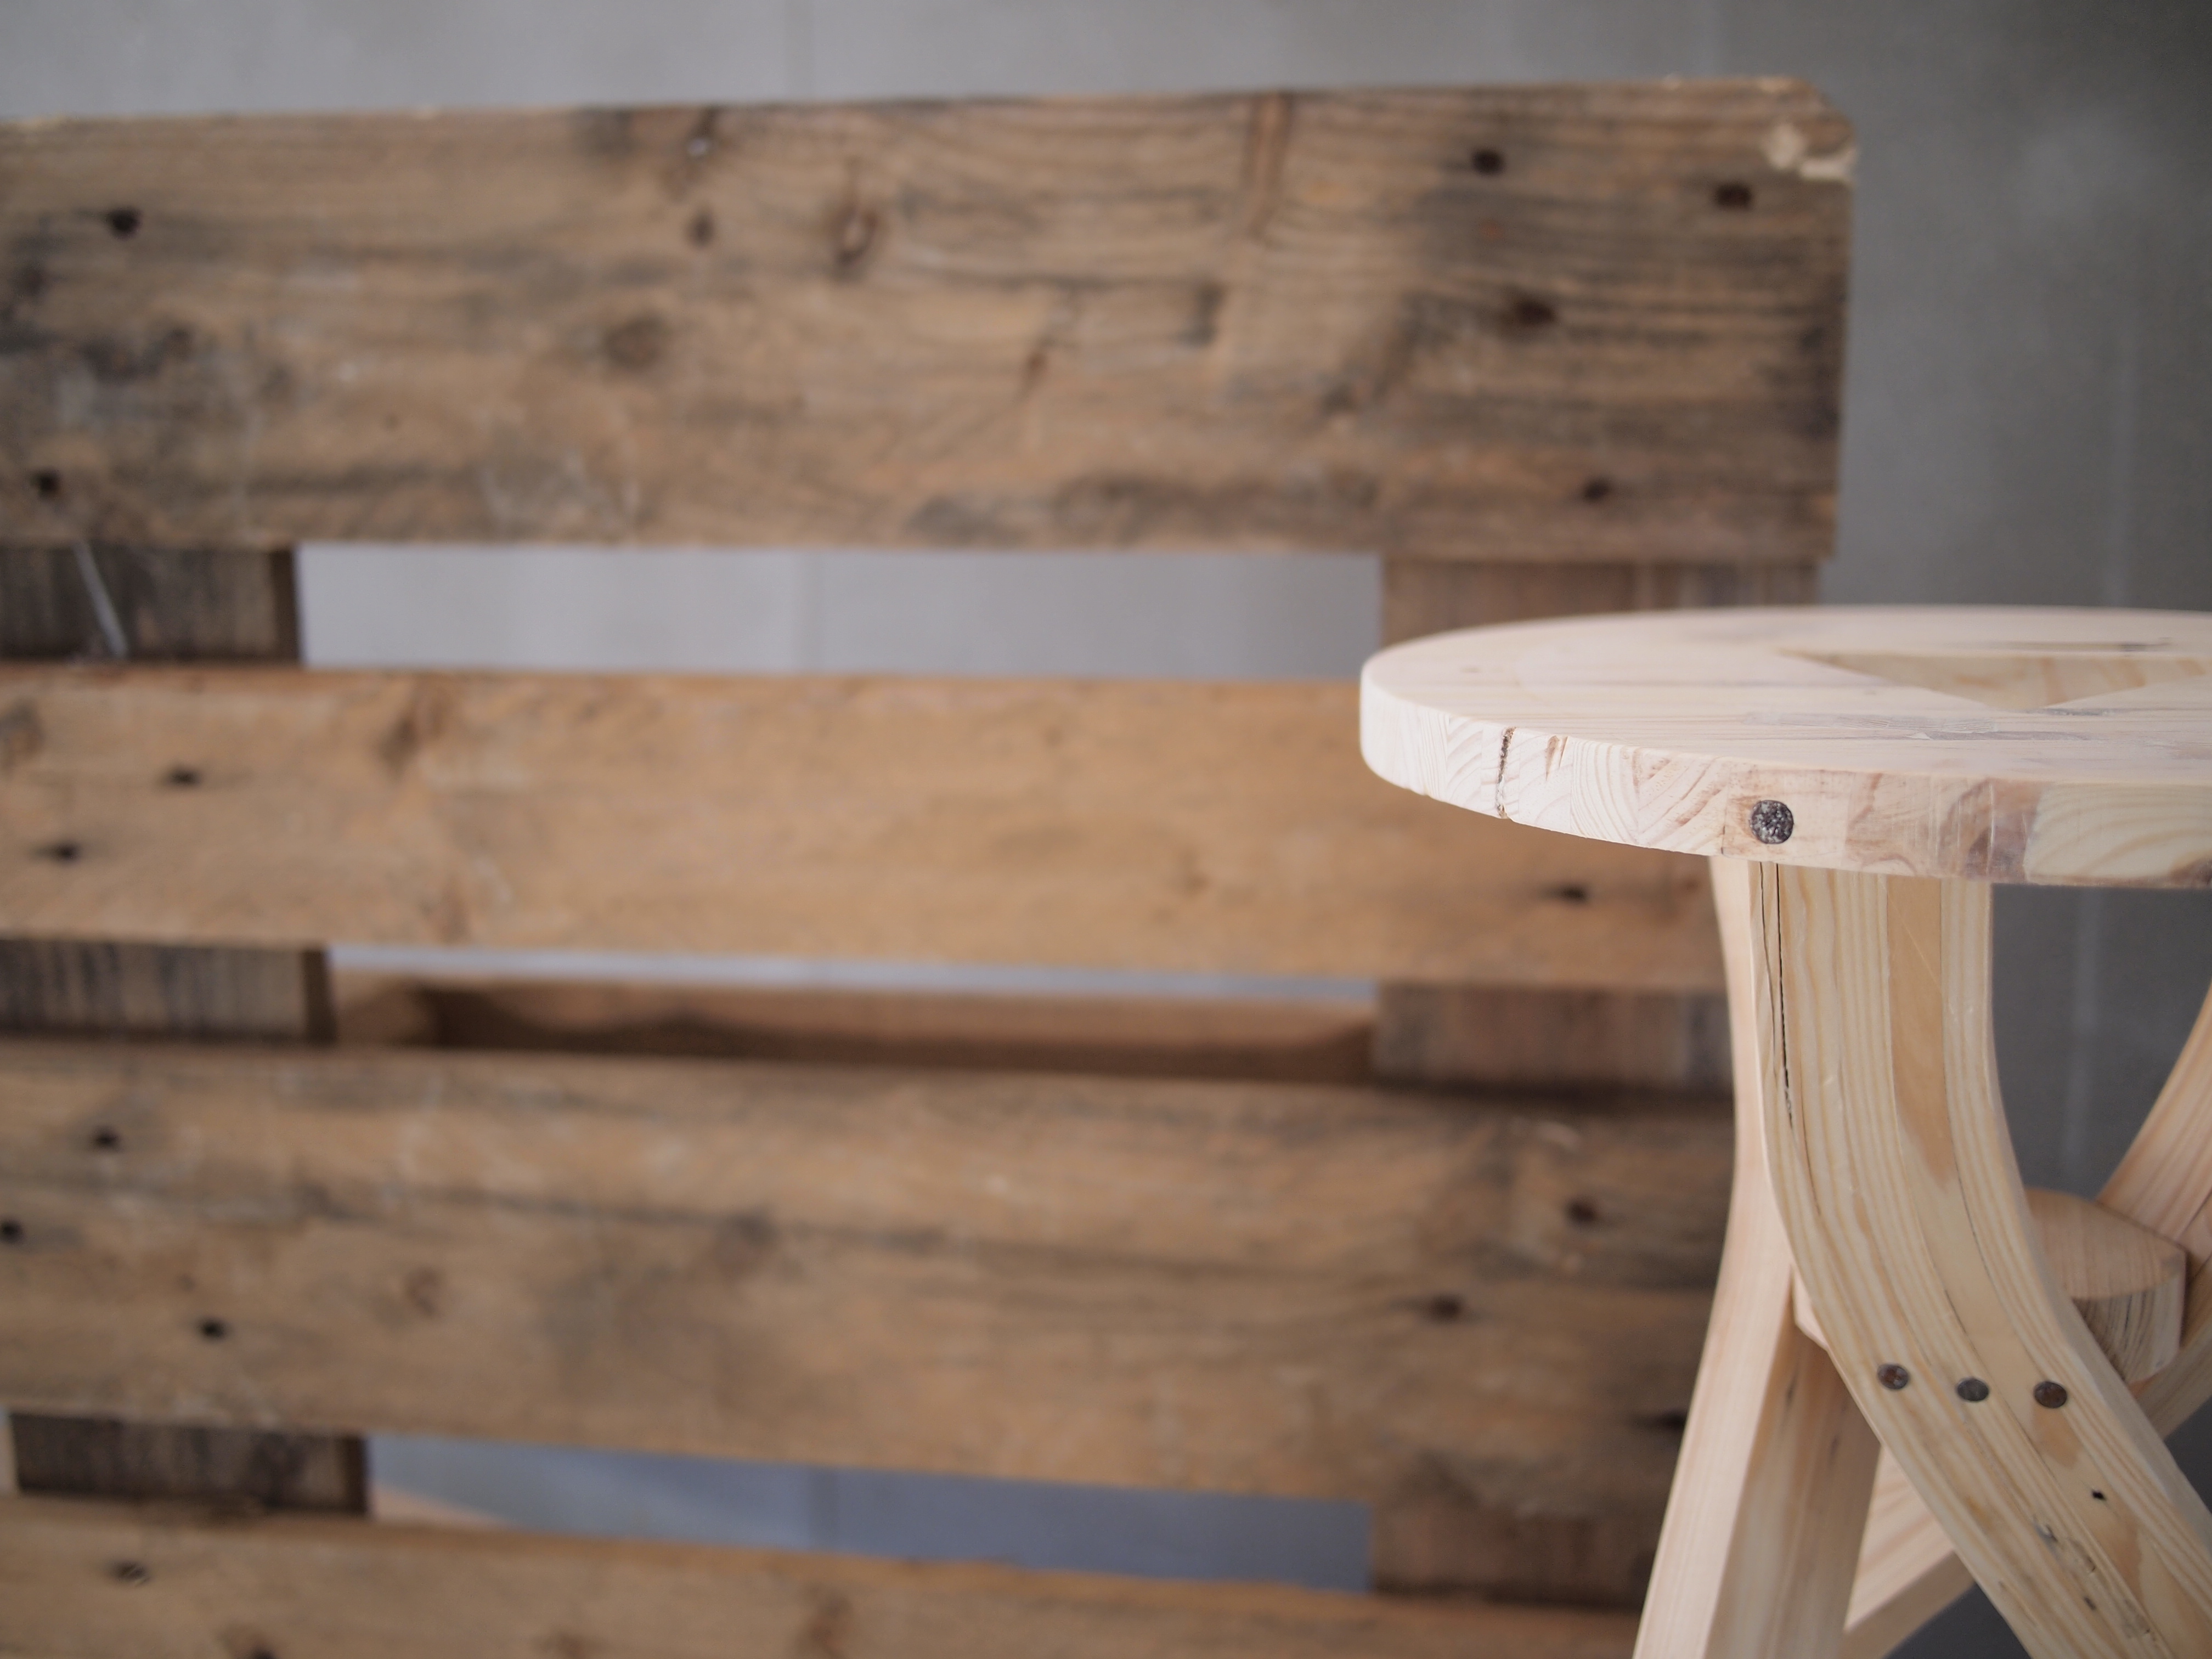 Shipping pallet stool